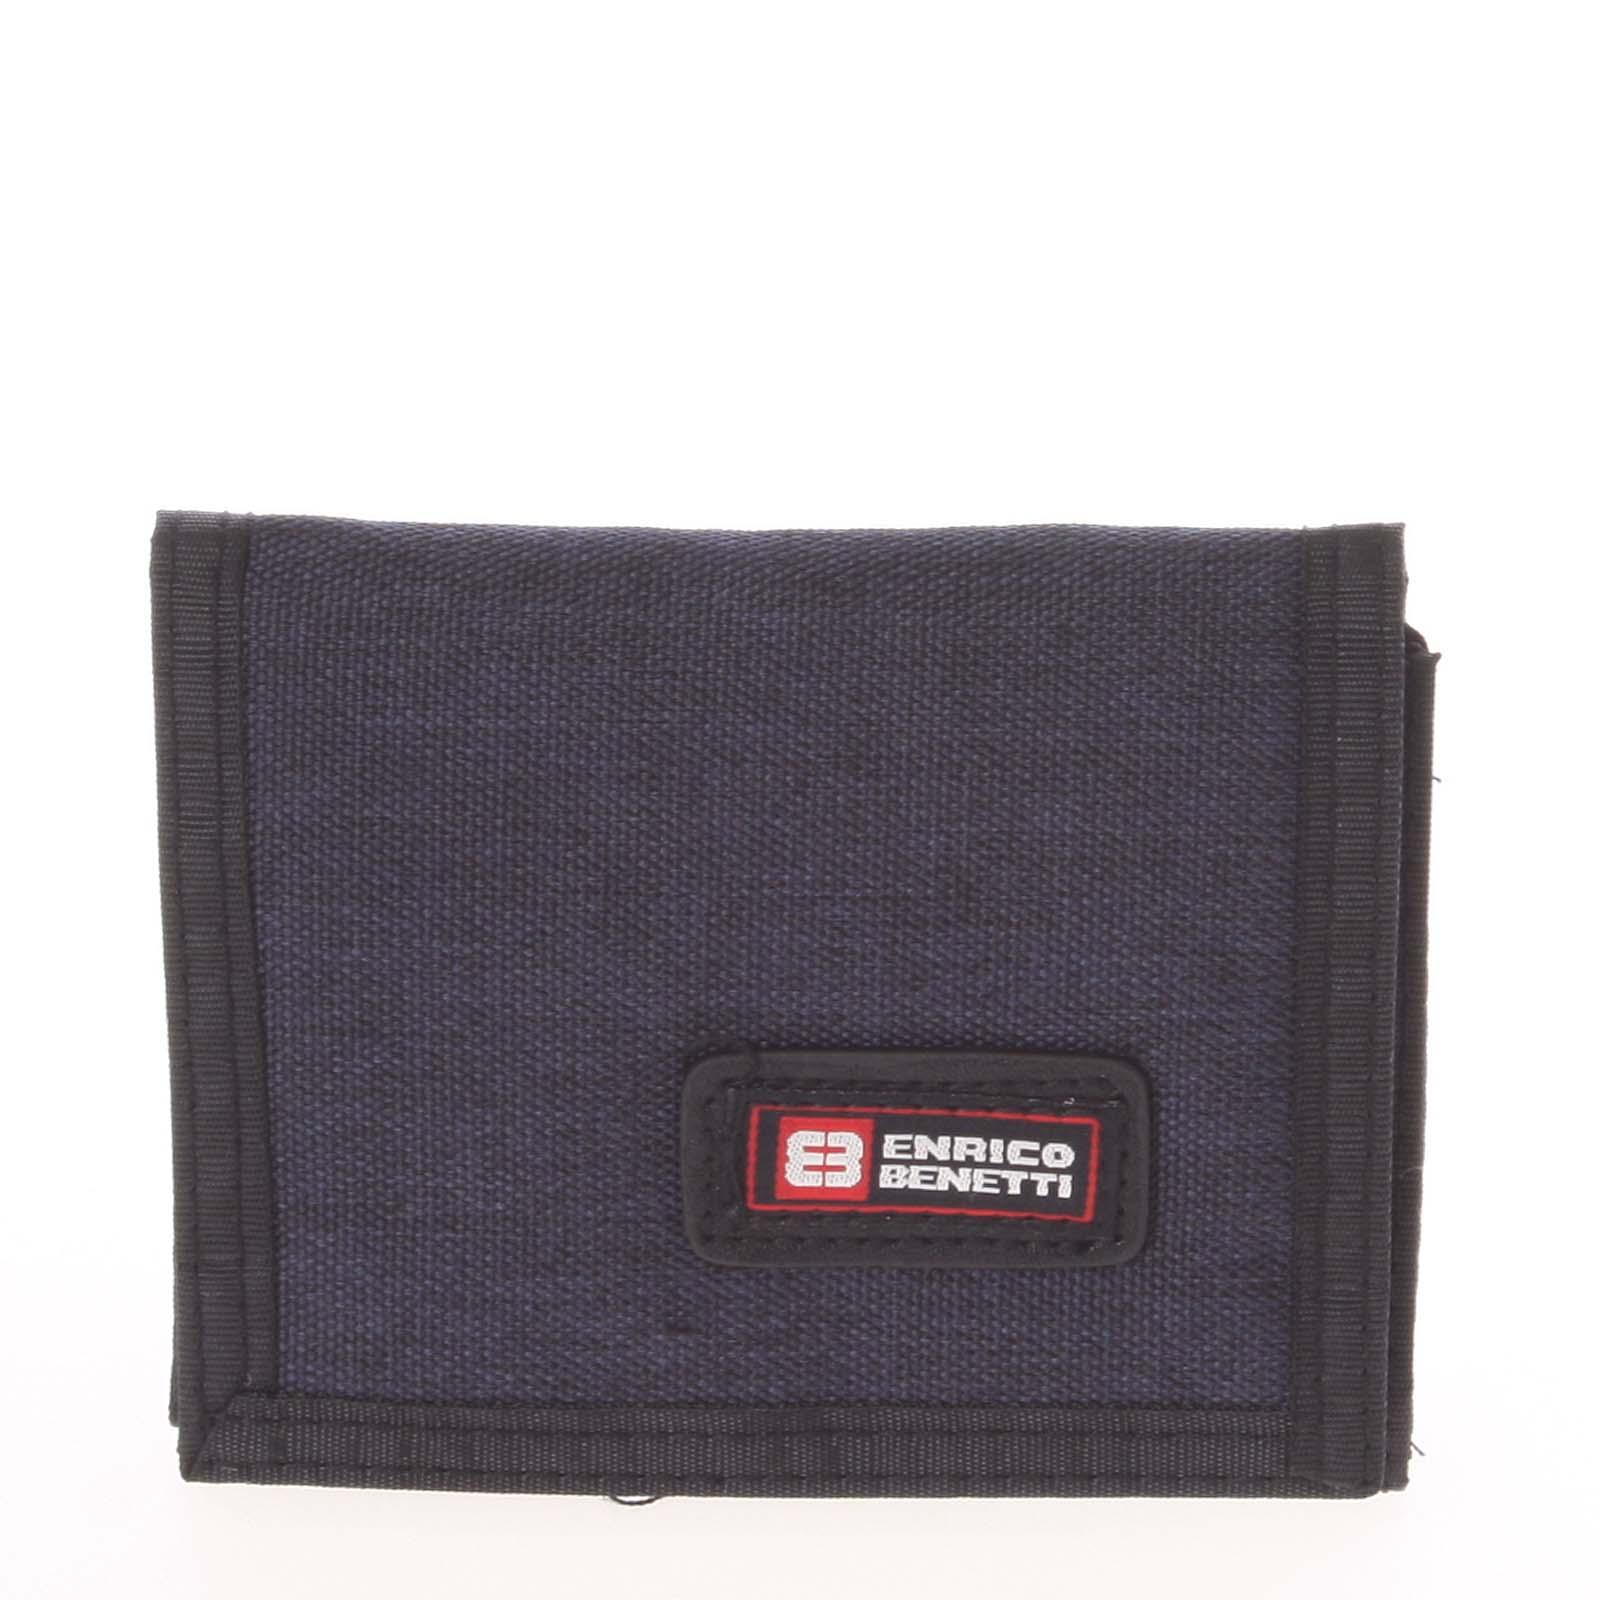 Peňaženka látková tmavomodrá - Enrico Benetti 4500